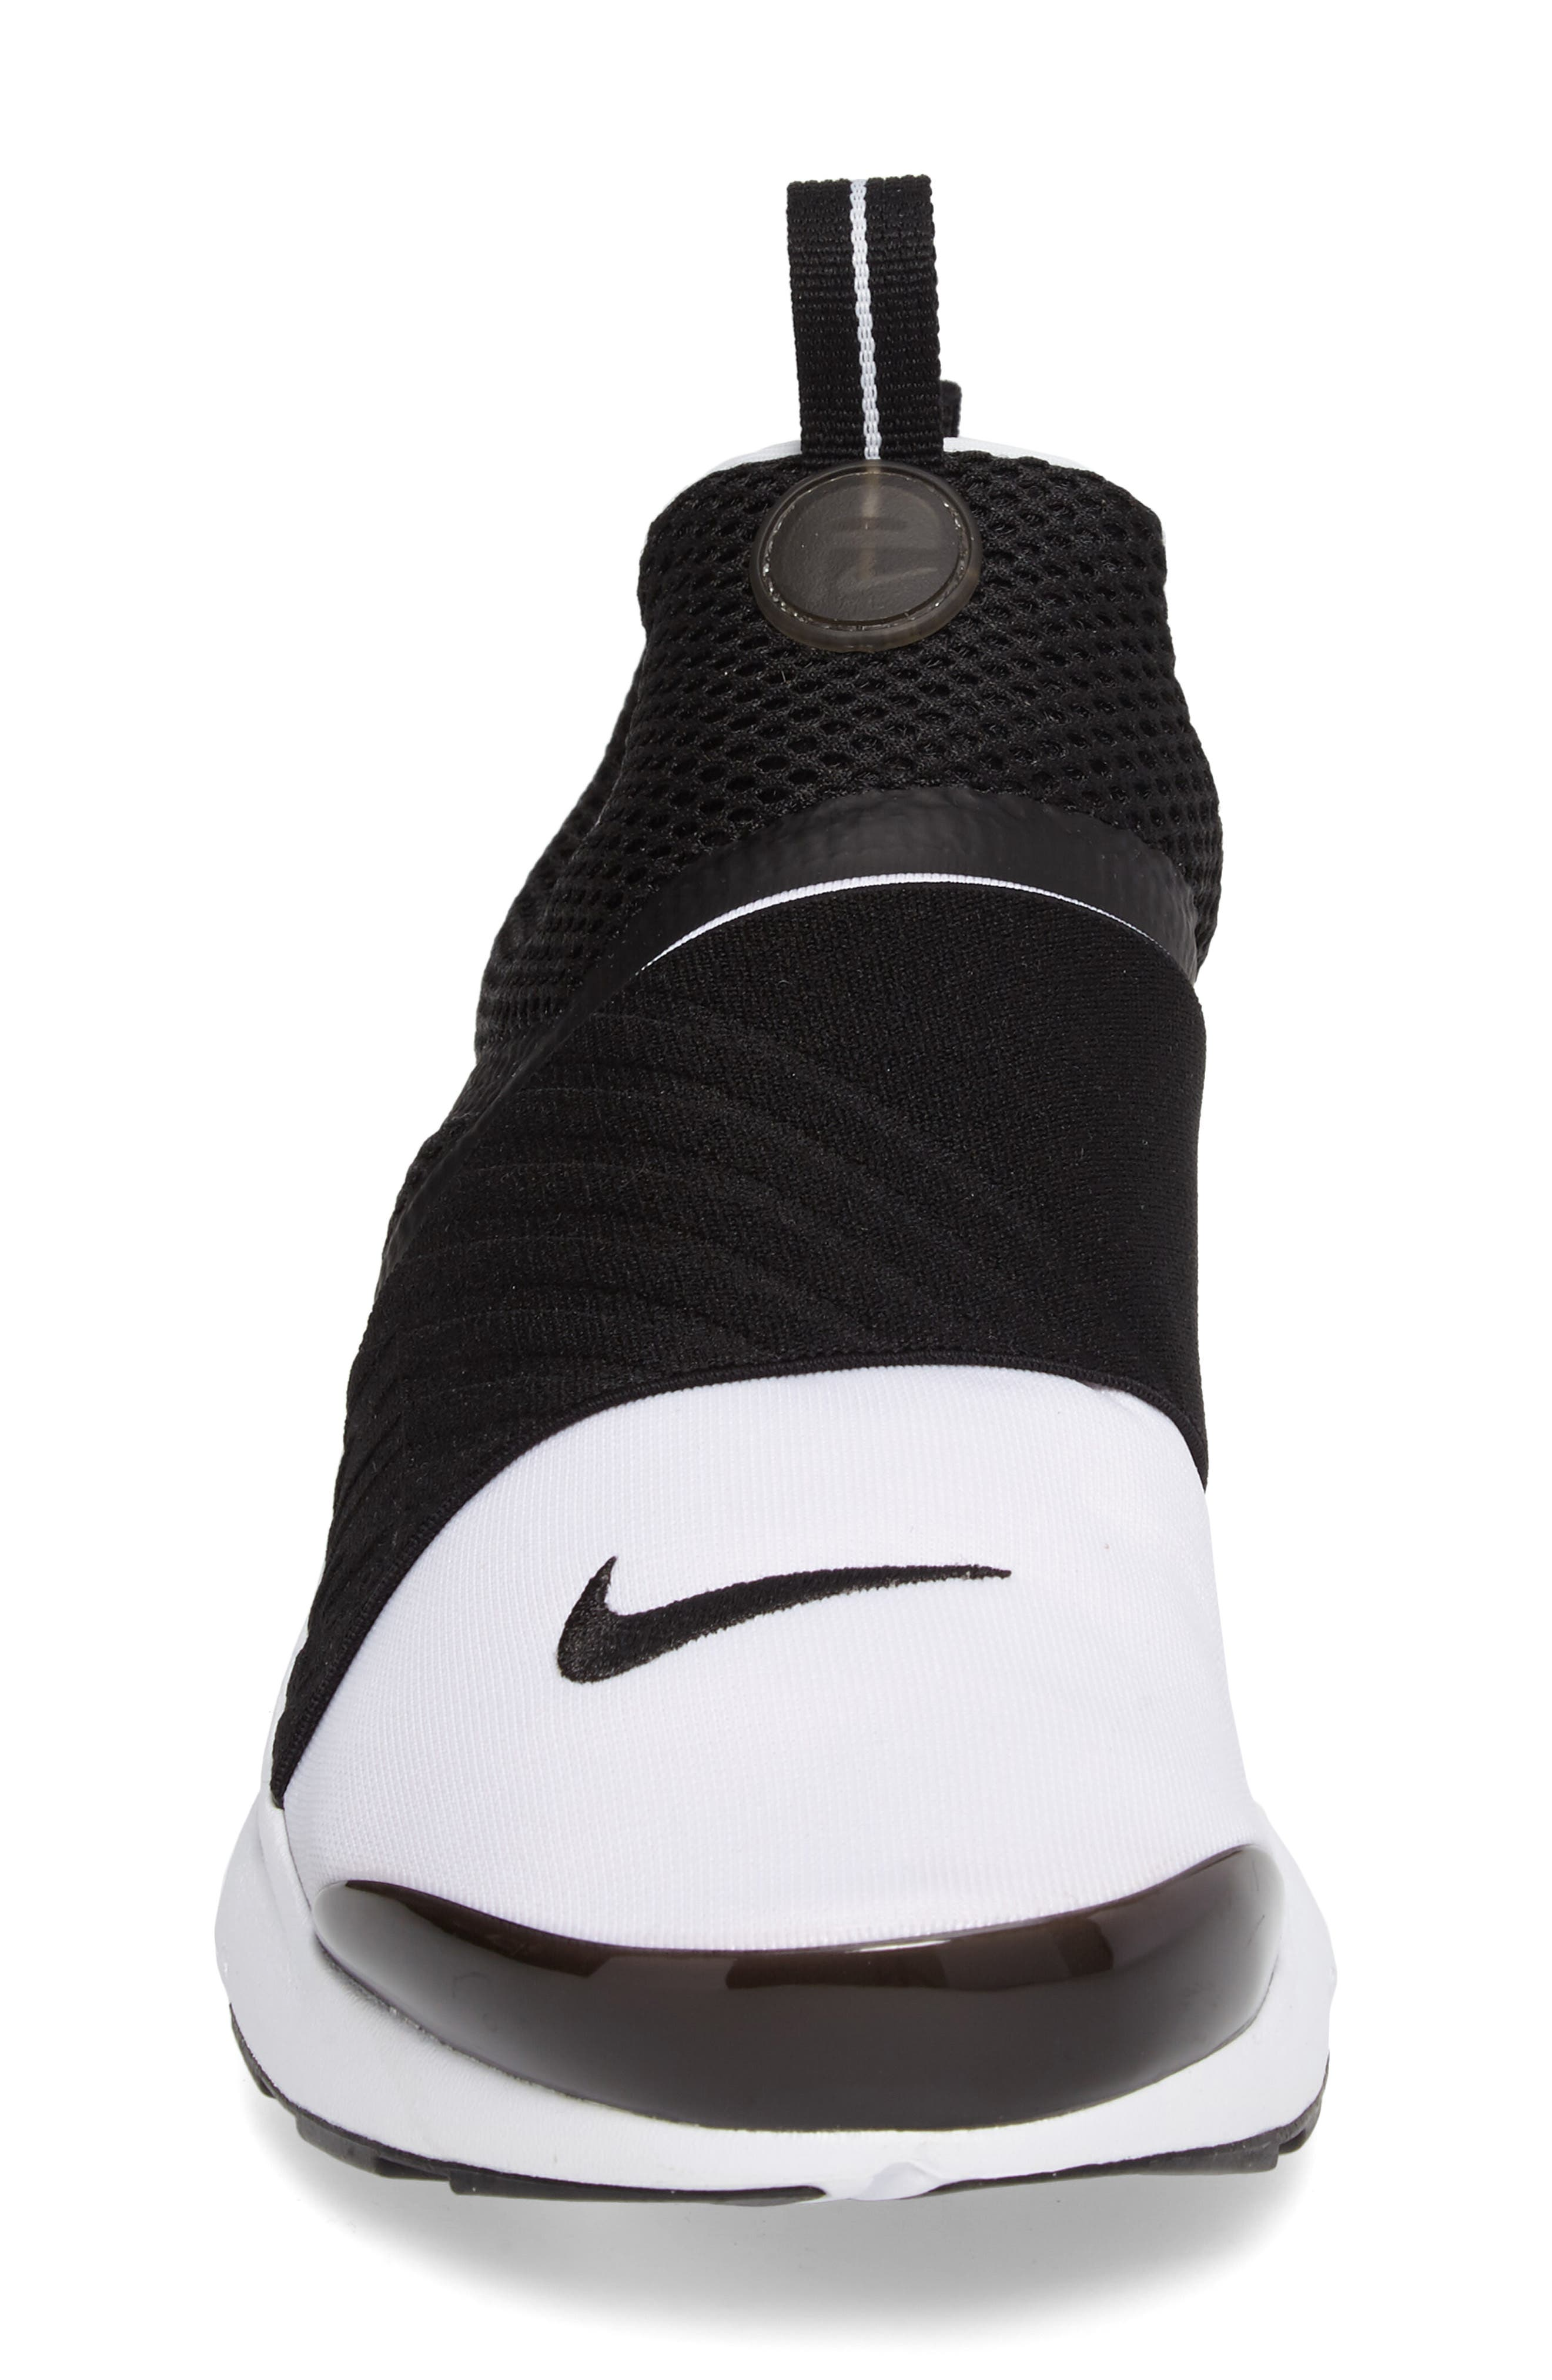 Presto Extreme Sneaker,                             Alternate thumbnail 40, color,